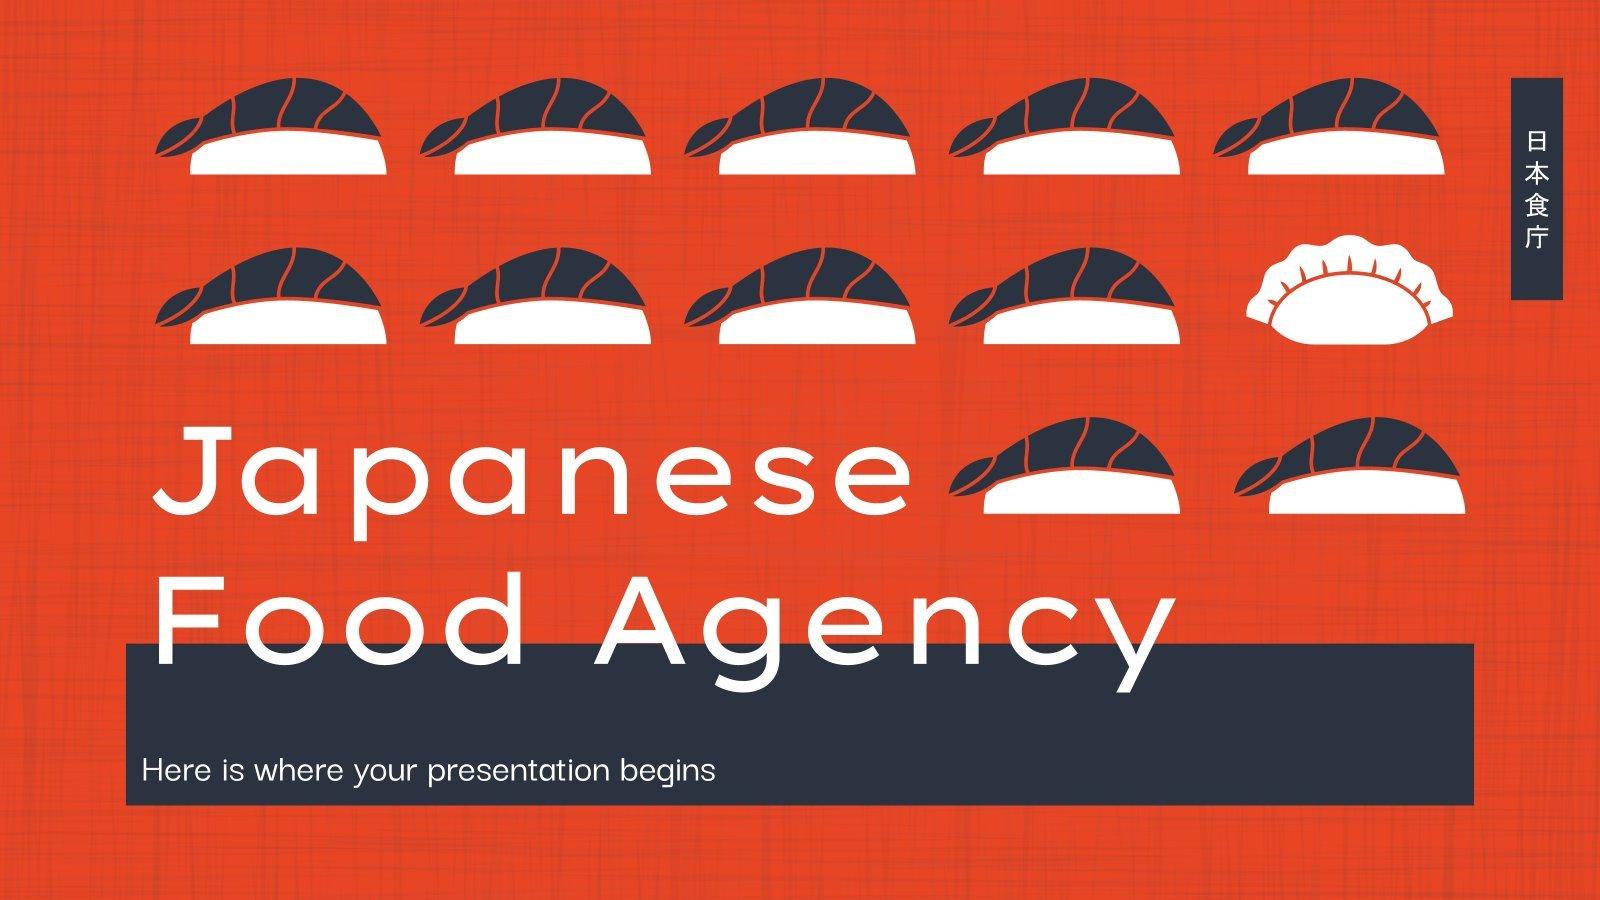 Japanese Food Agency presentation template